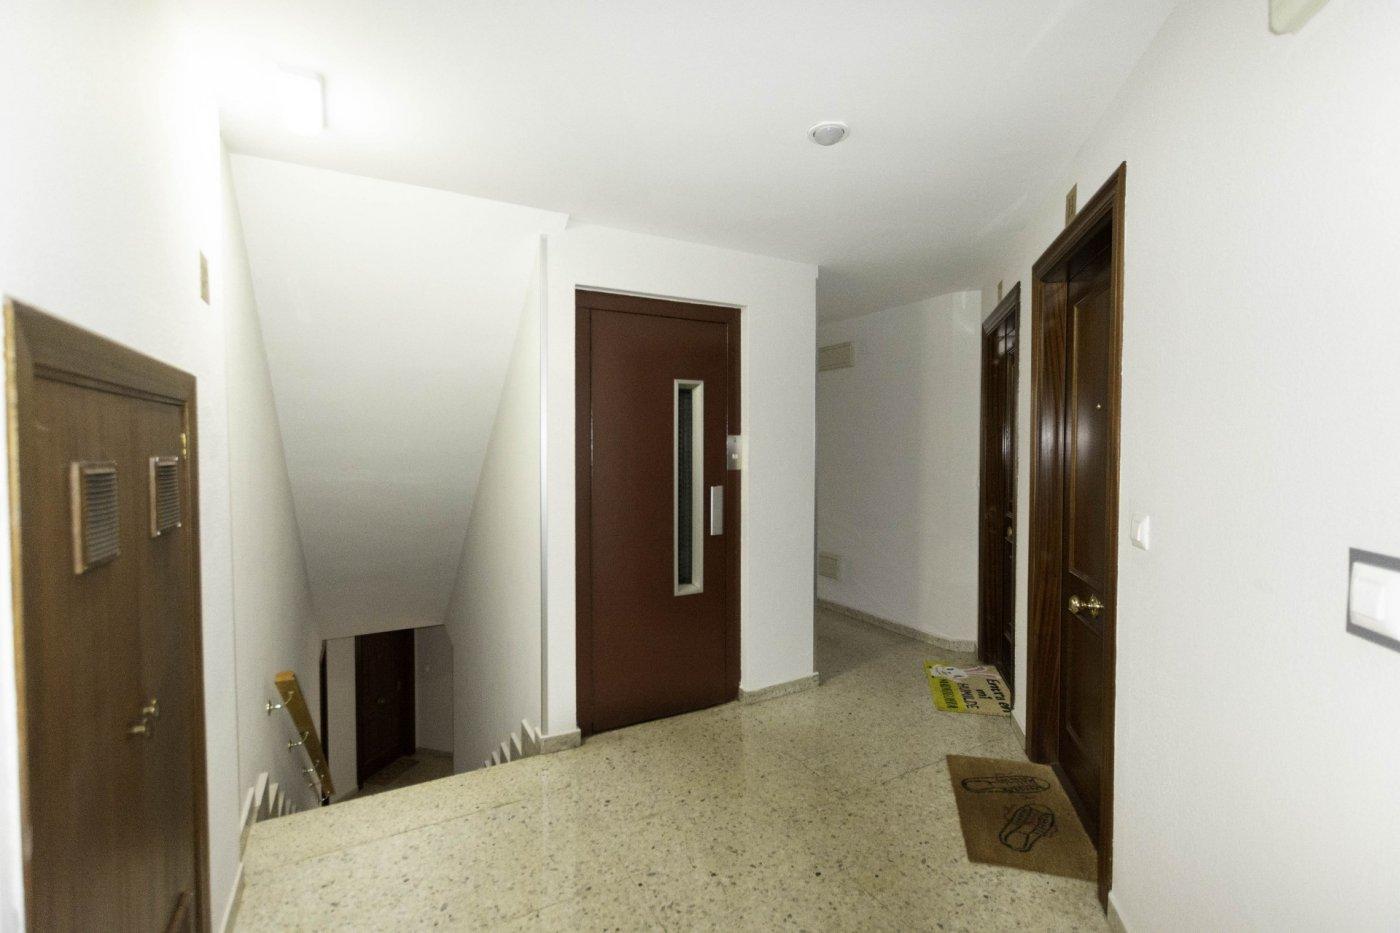 Apartamento en vallobin - imagenInmueble19